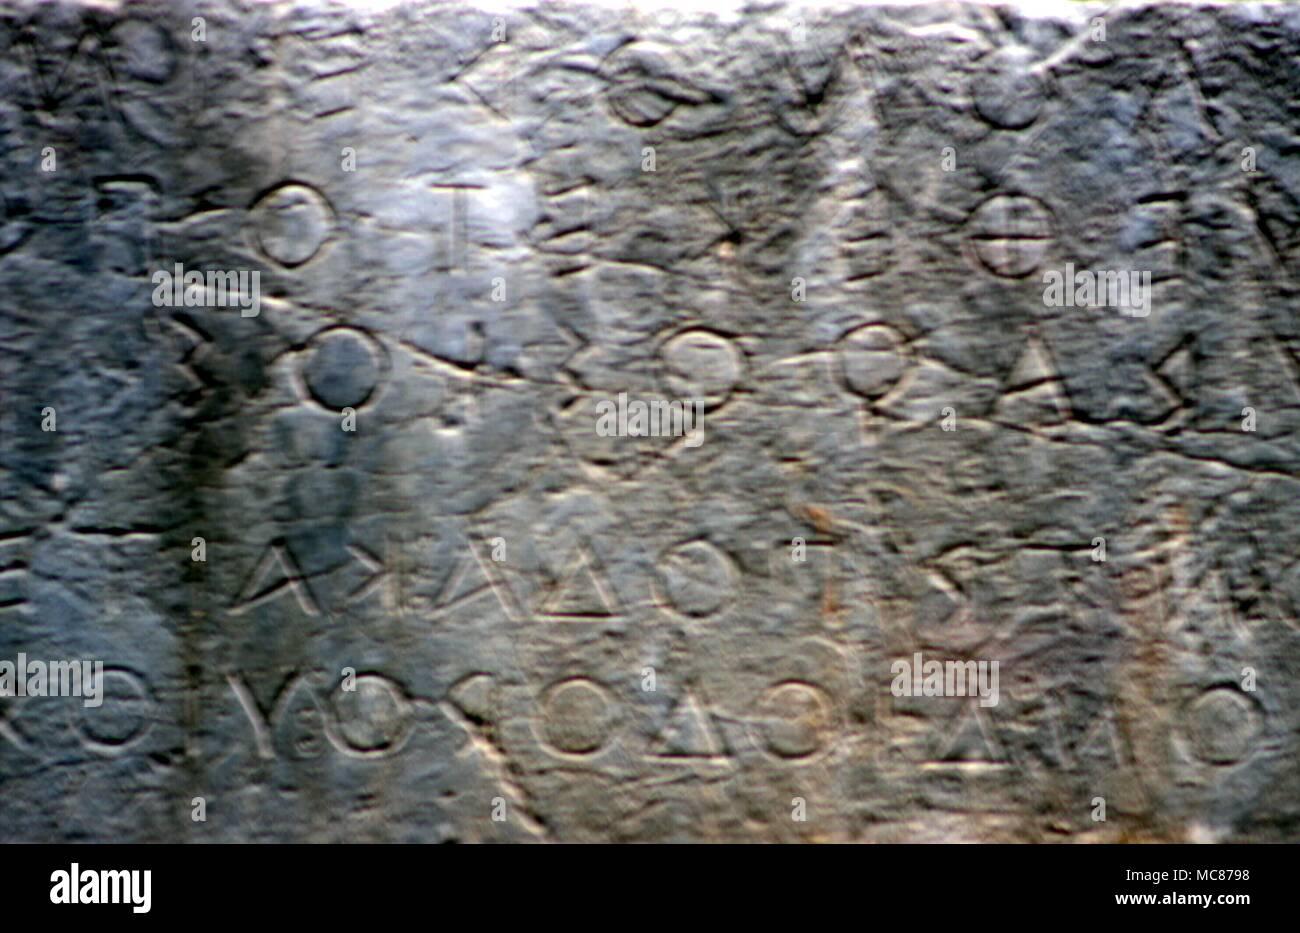 Delphi Uppercase First Letter